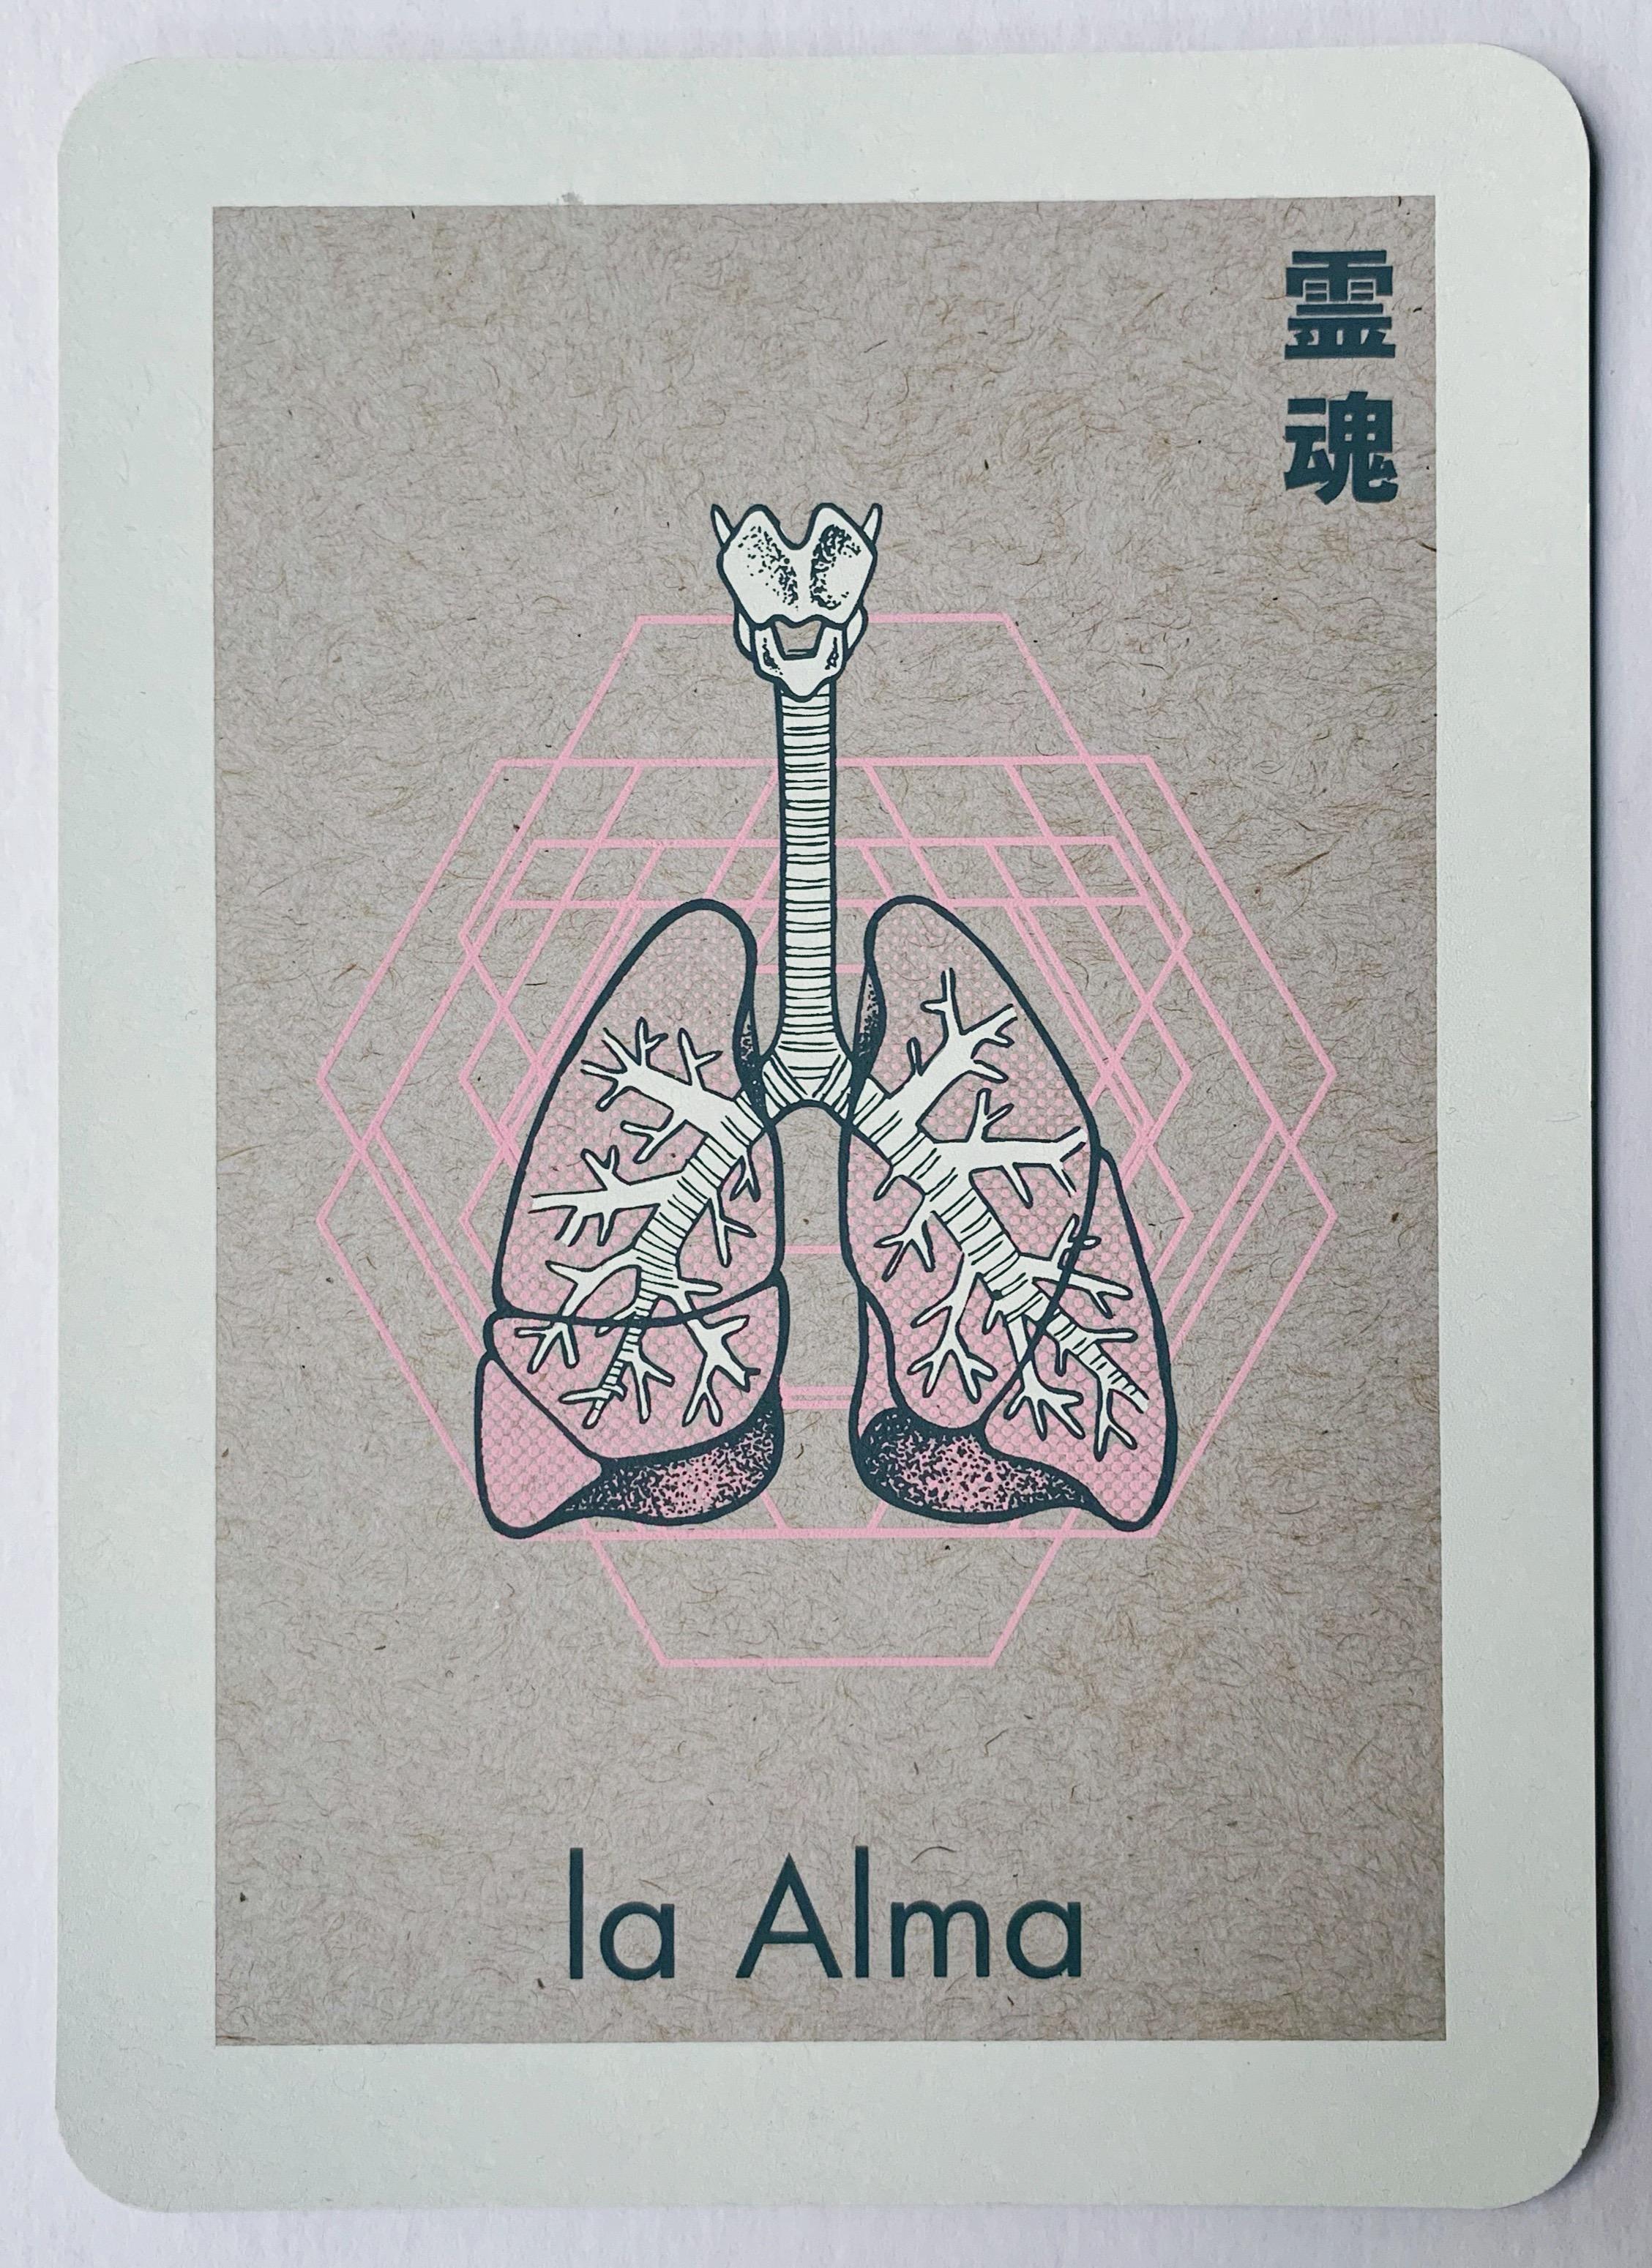 la Alma, serigraphy, 2018